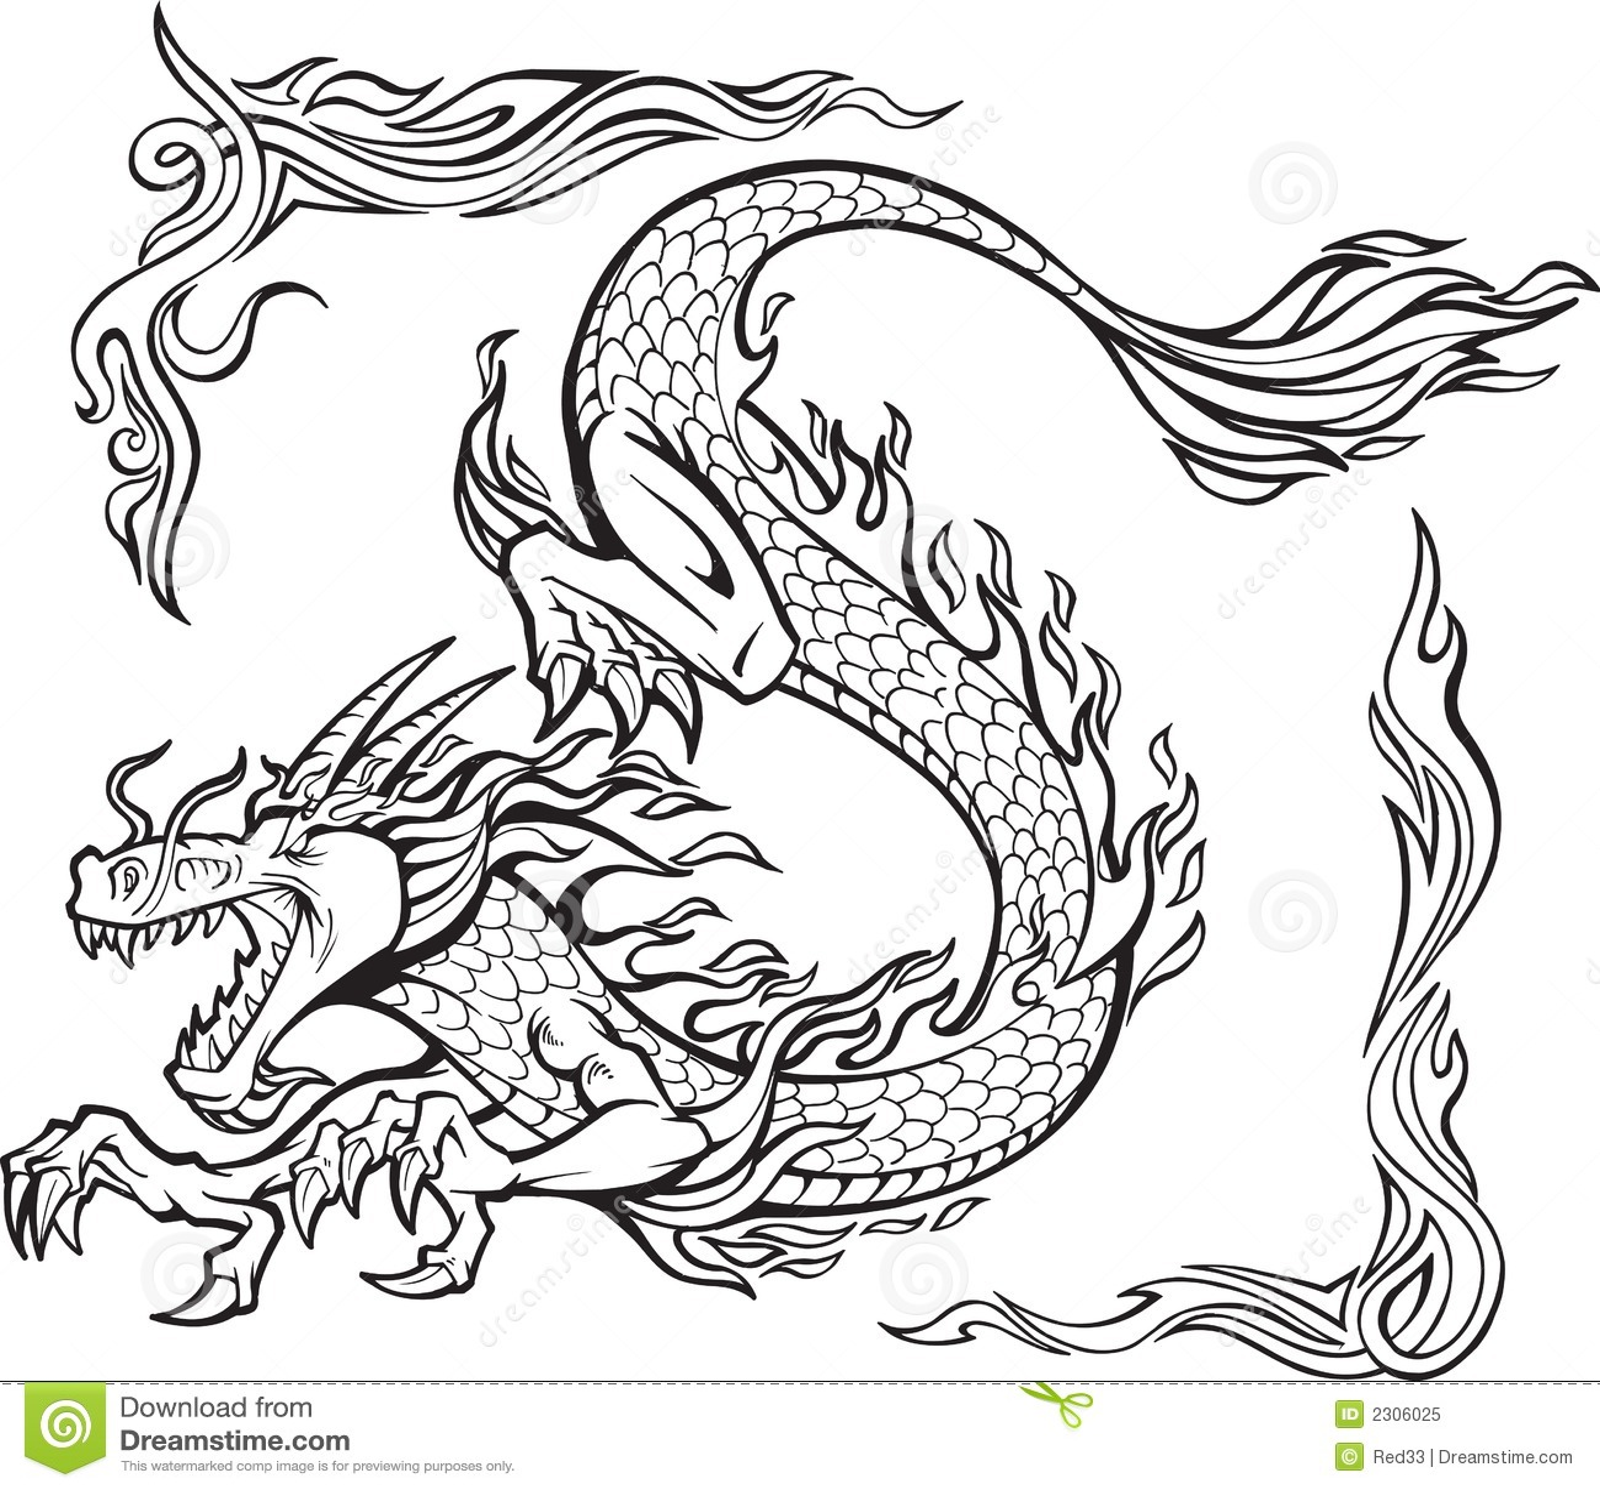 Feuer-Drache-Abbildung